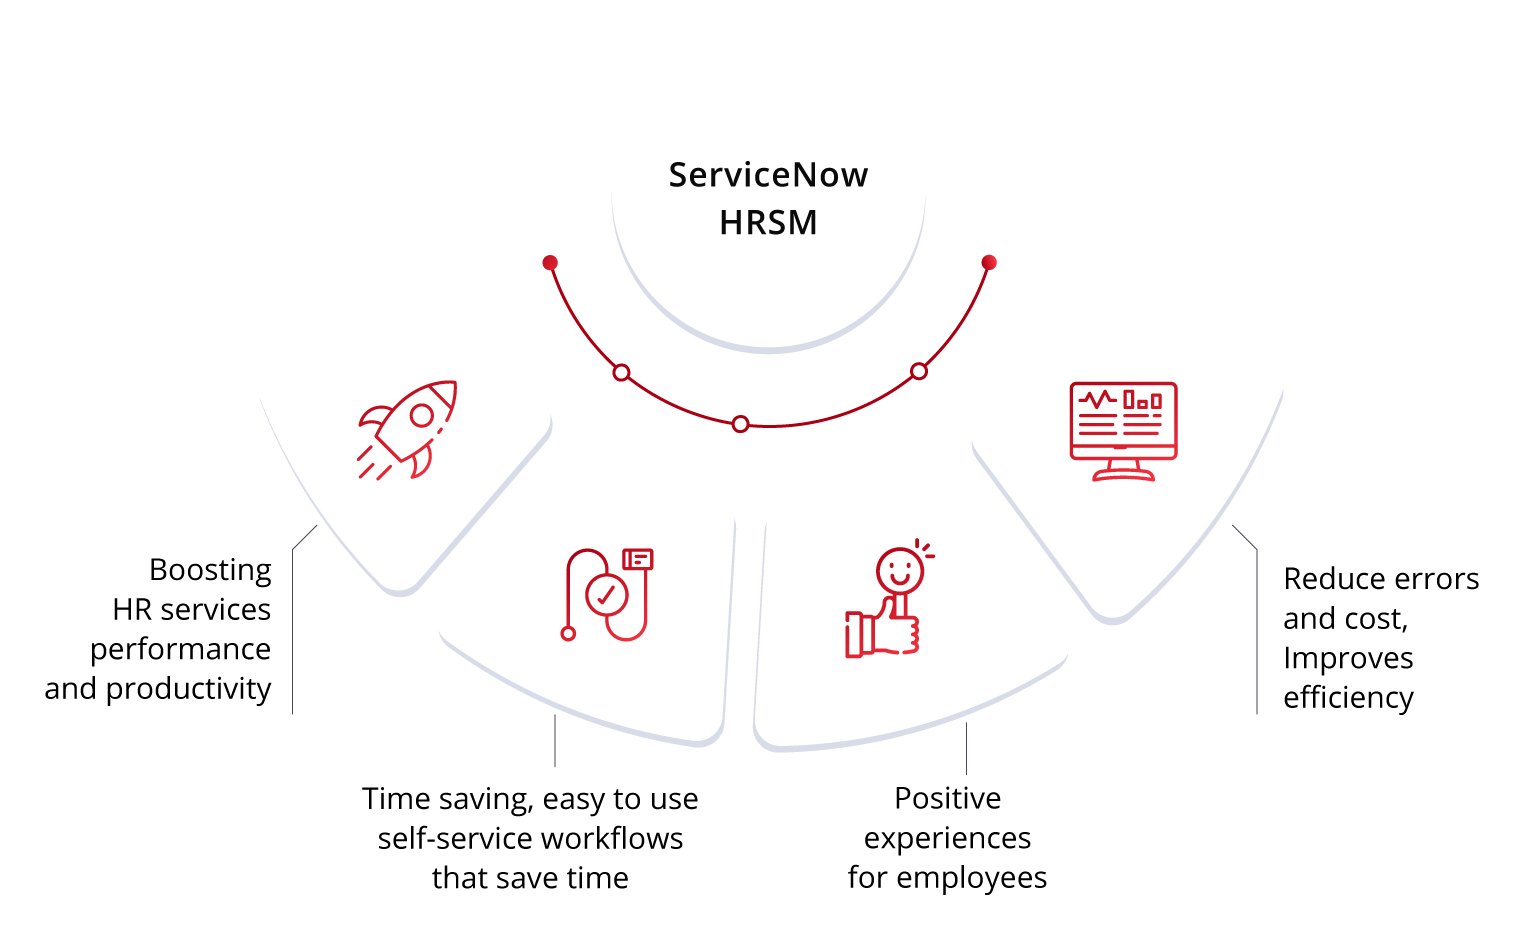 img-servicenow-hrsm-qbrainx-benefits